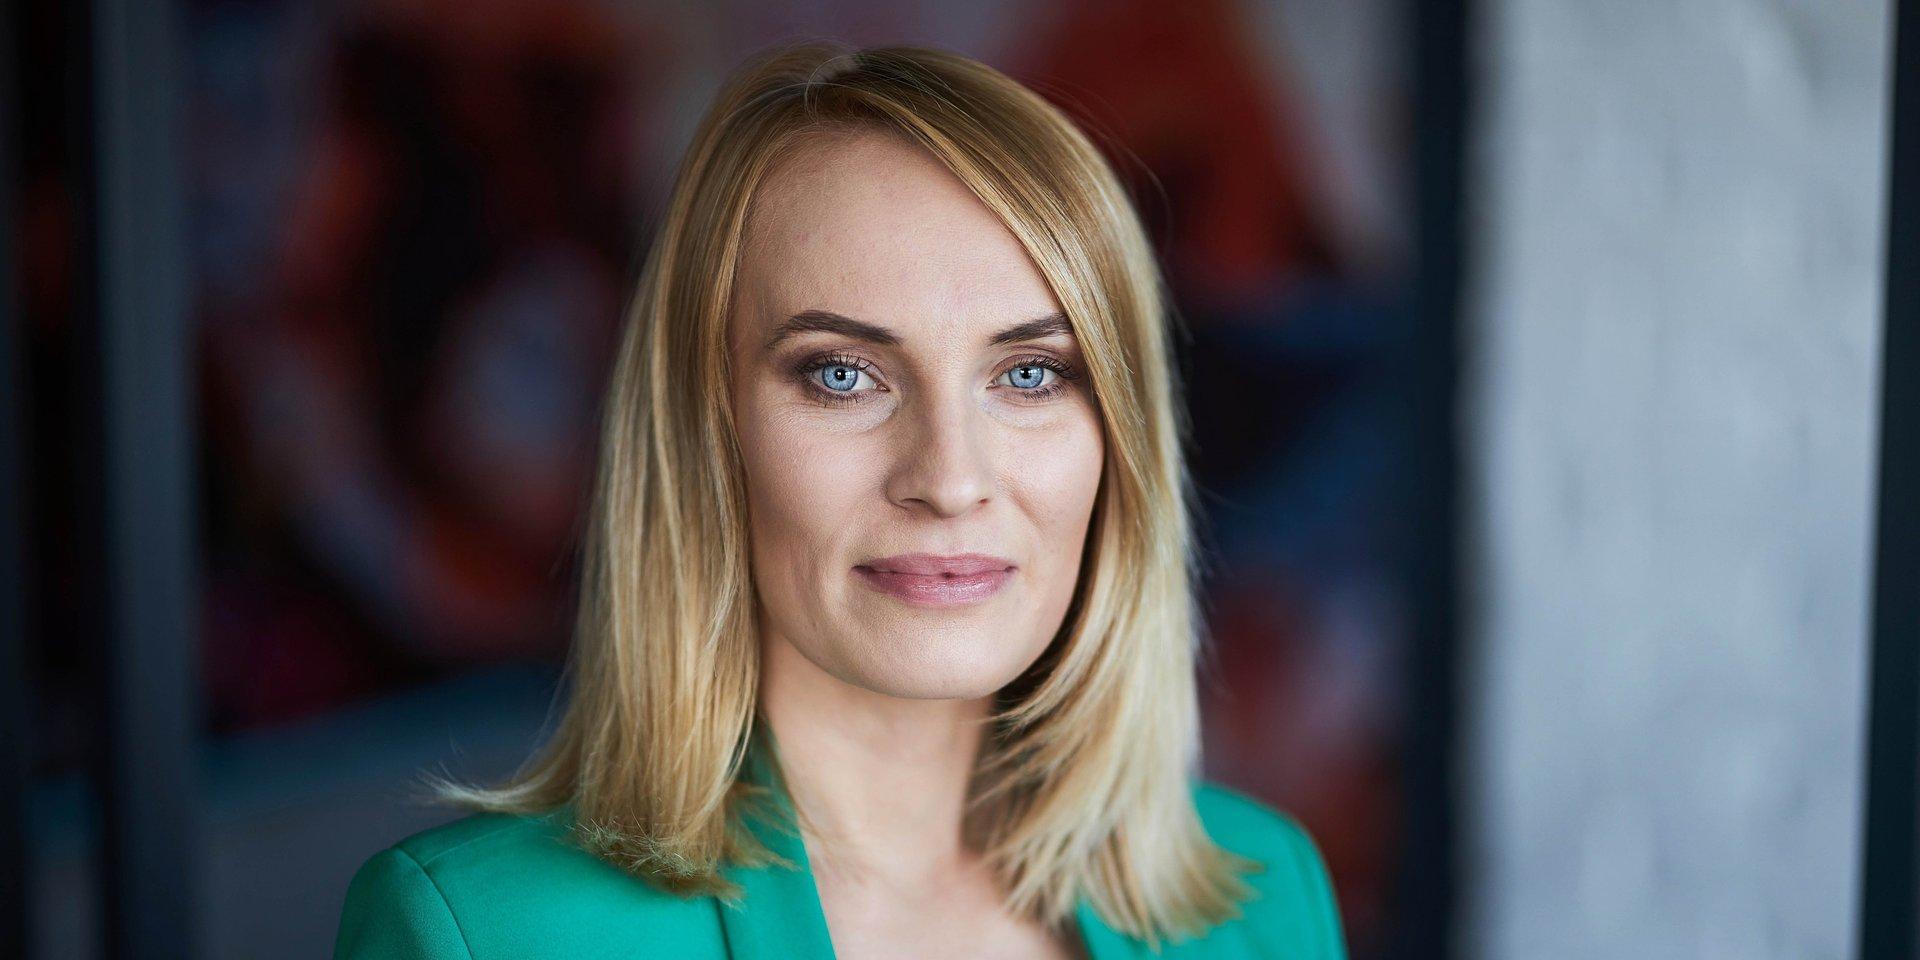 zdrowie: dr n. med. Aleksandra Nowicka-Jasztal